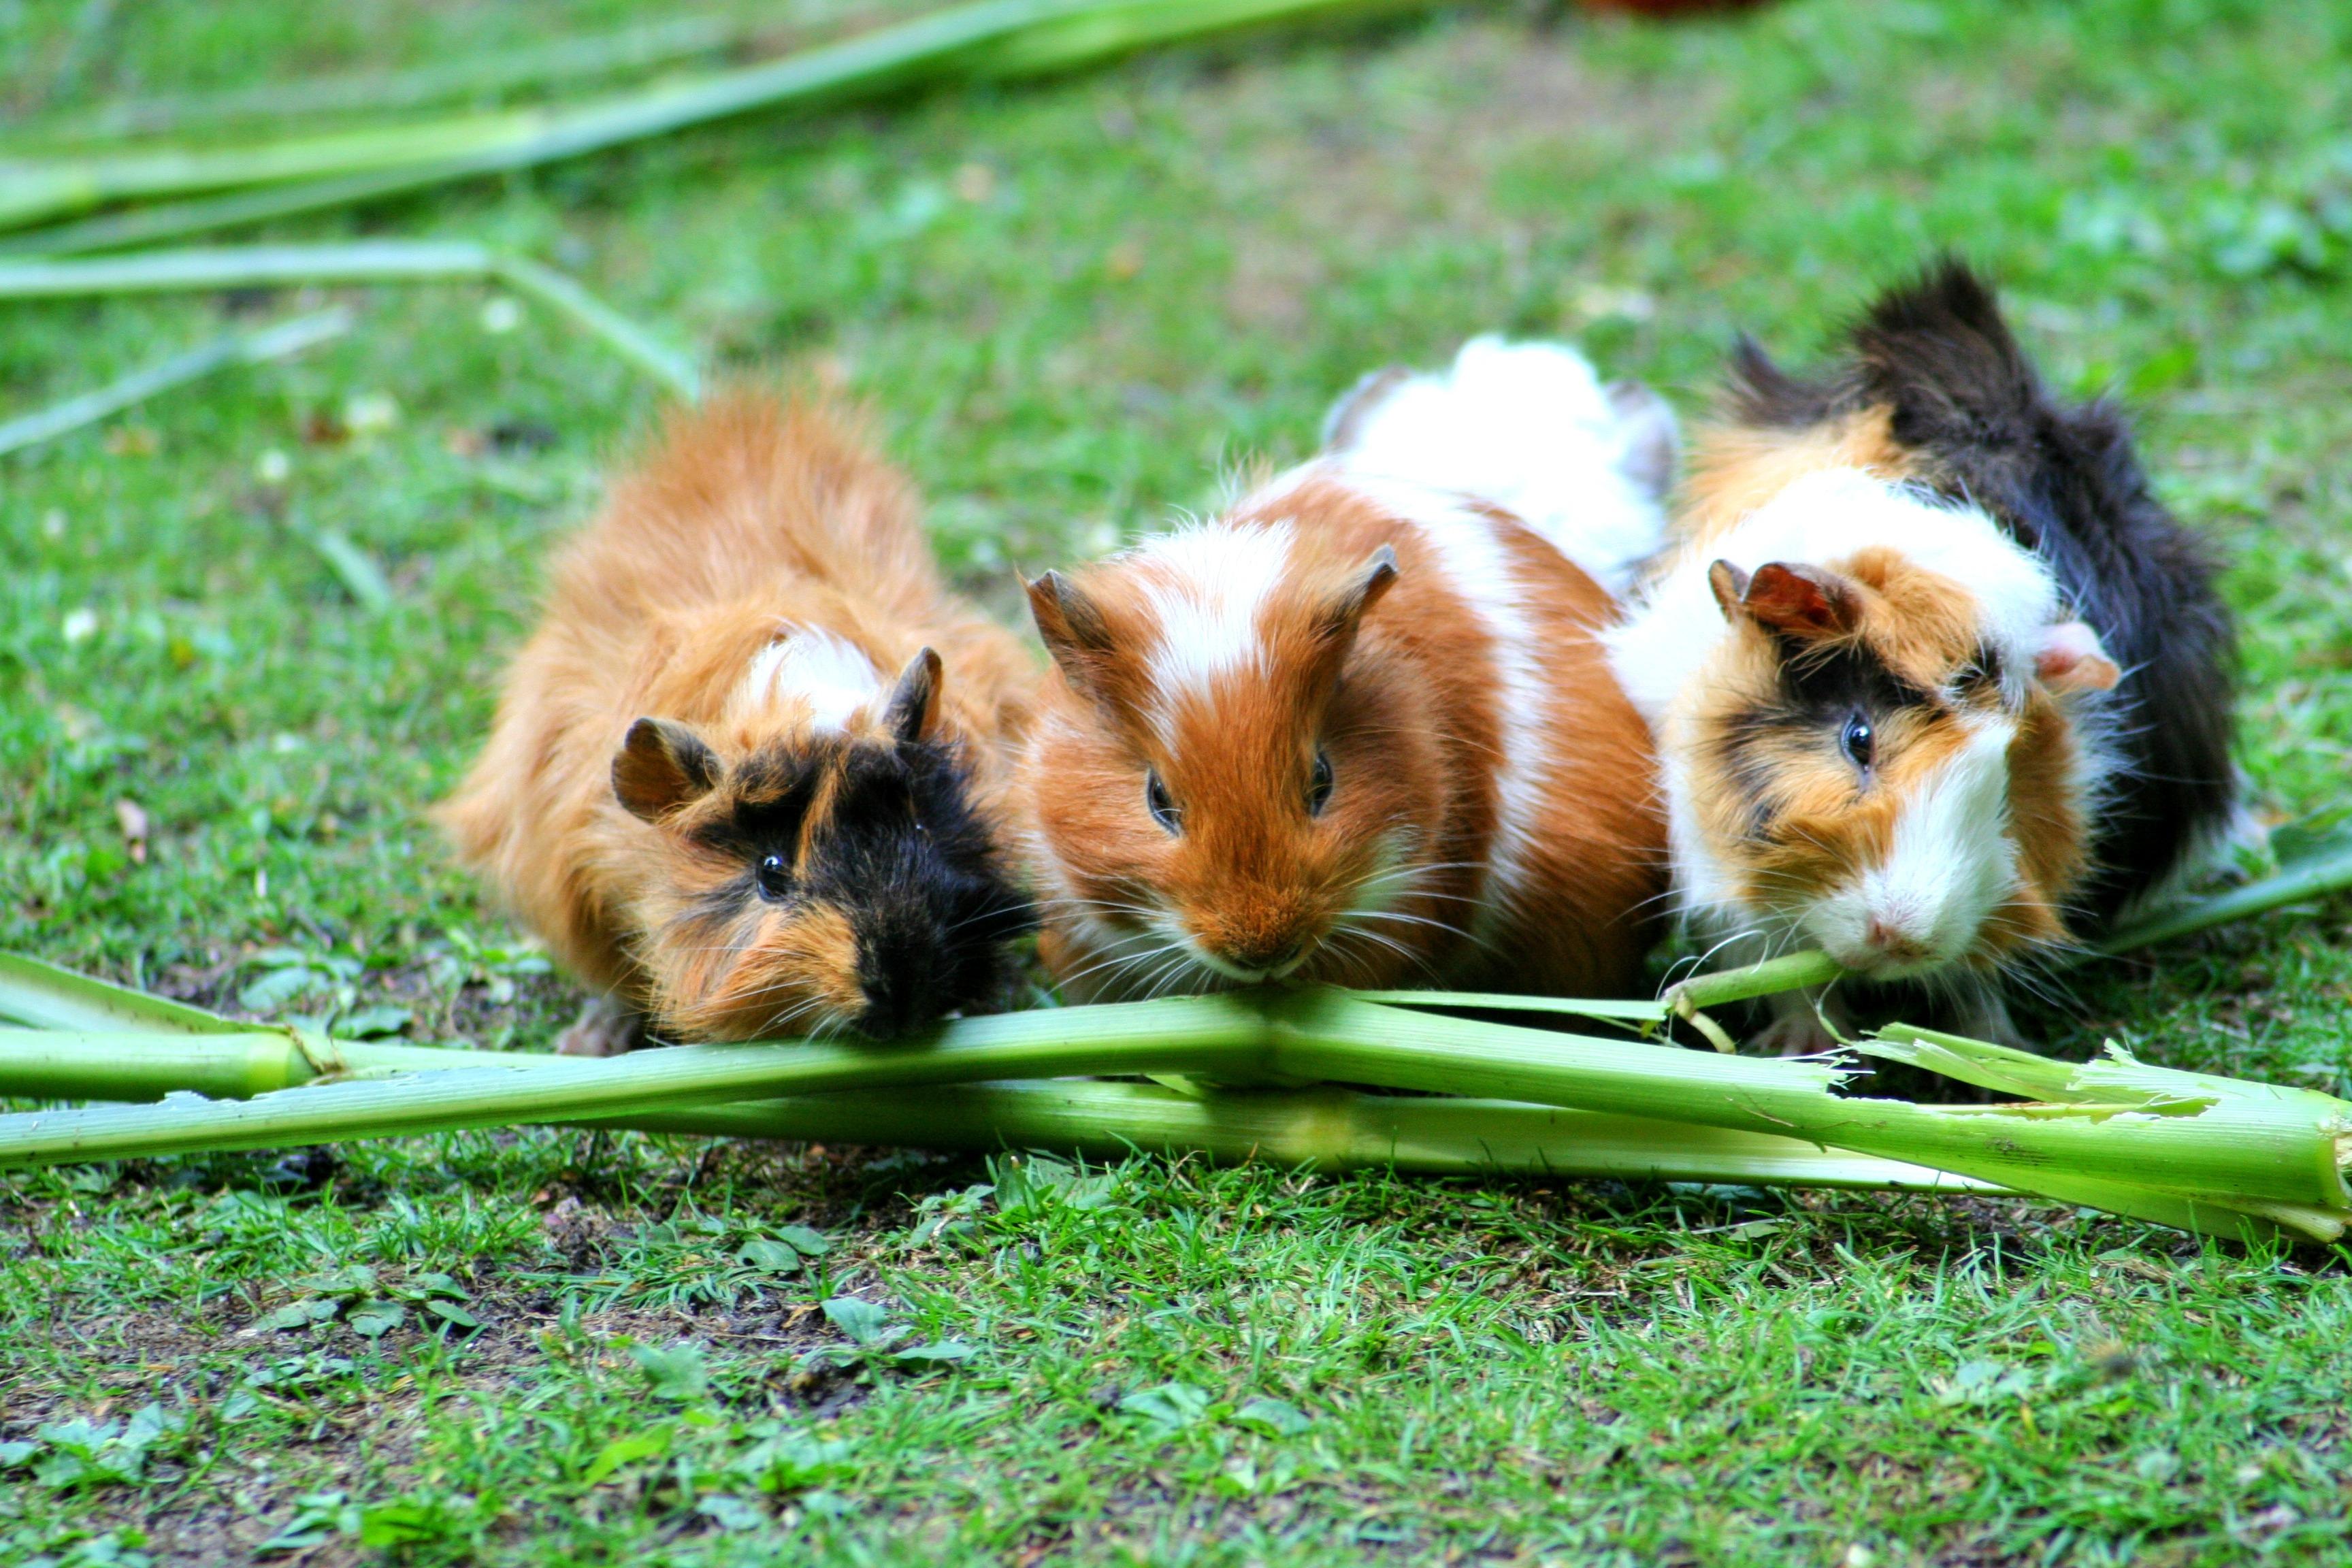 Munching guinea pigs